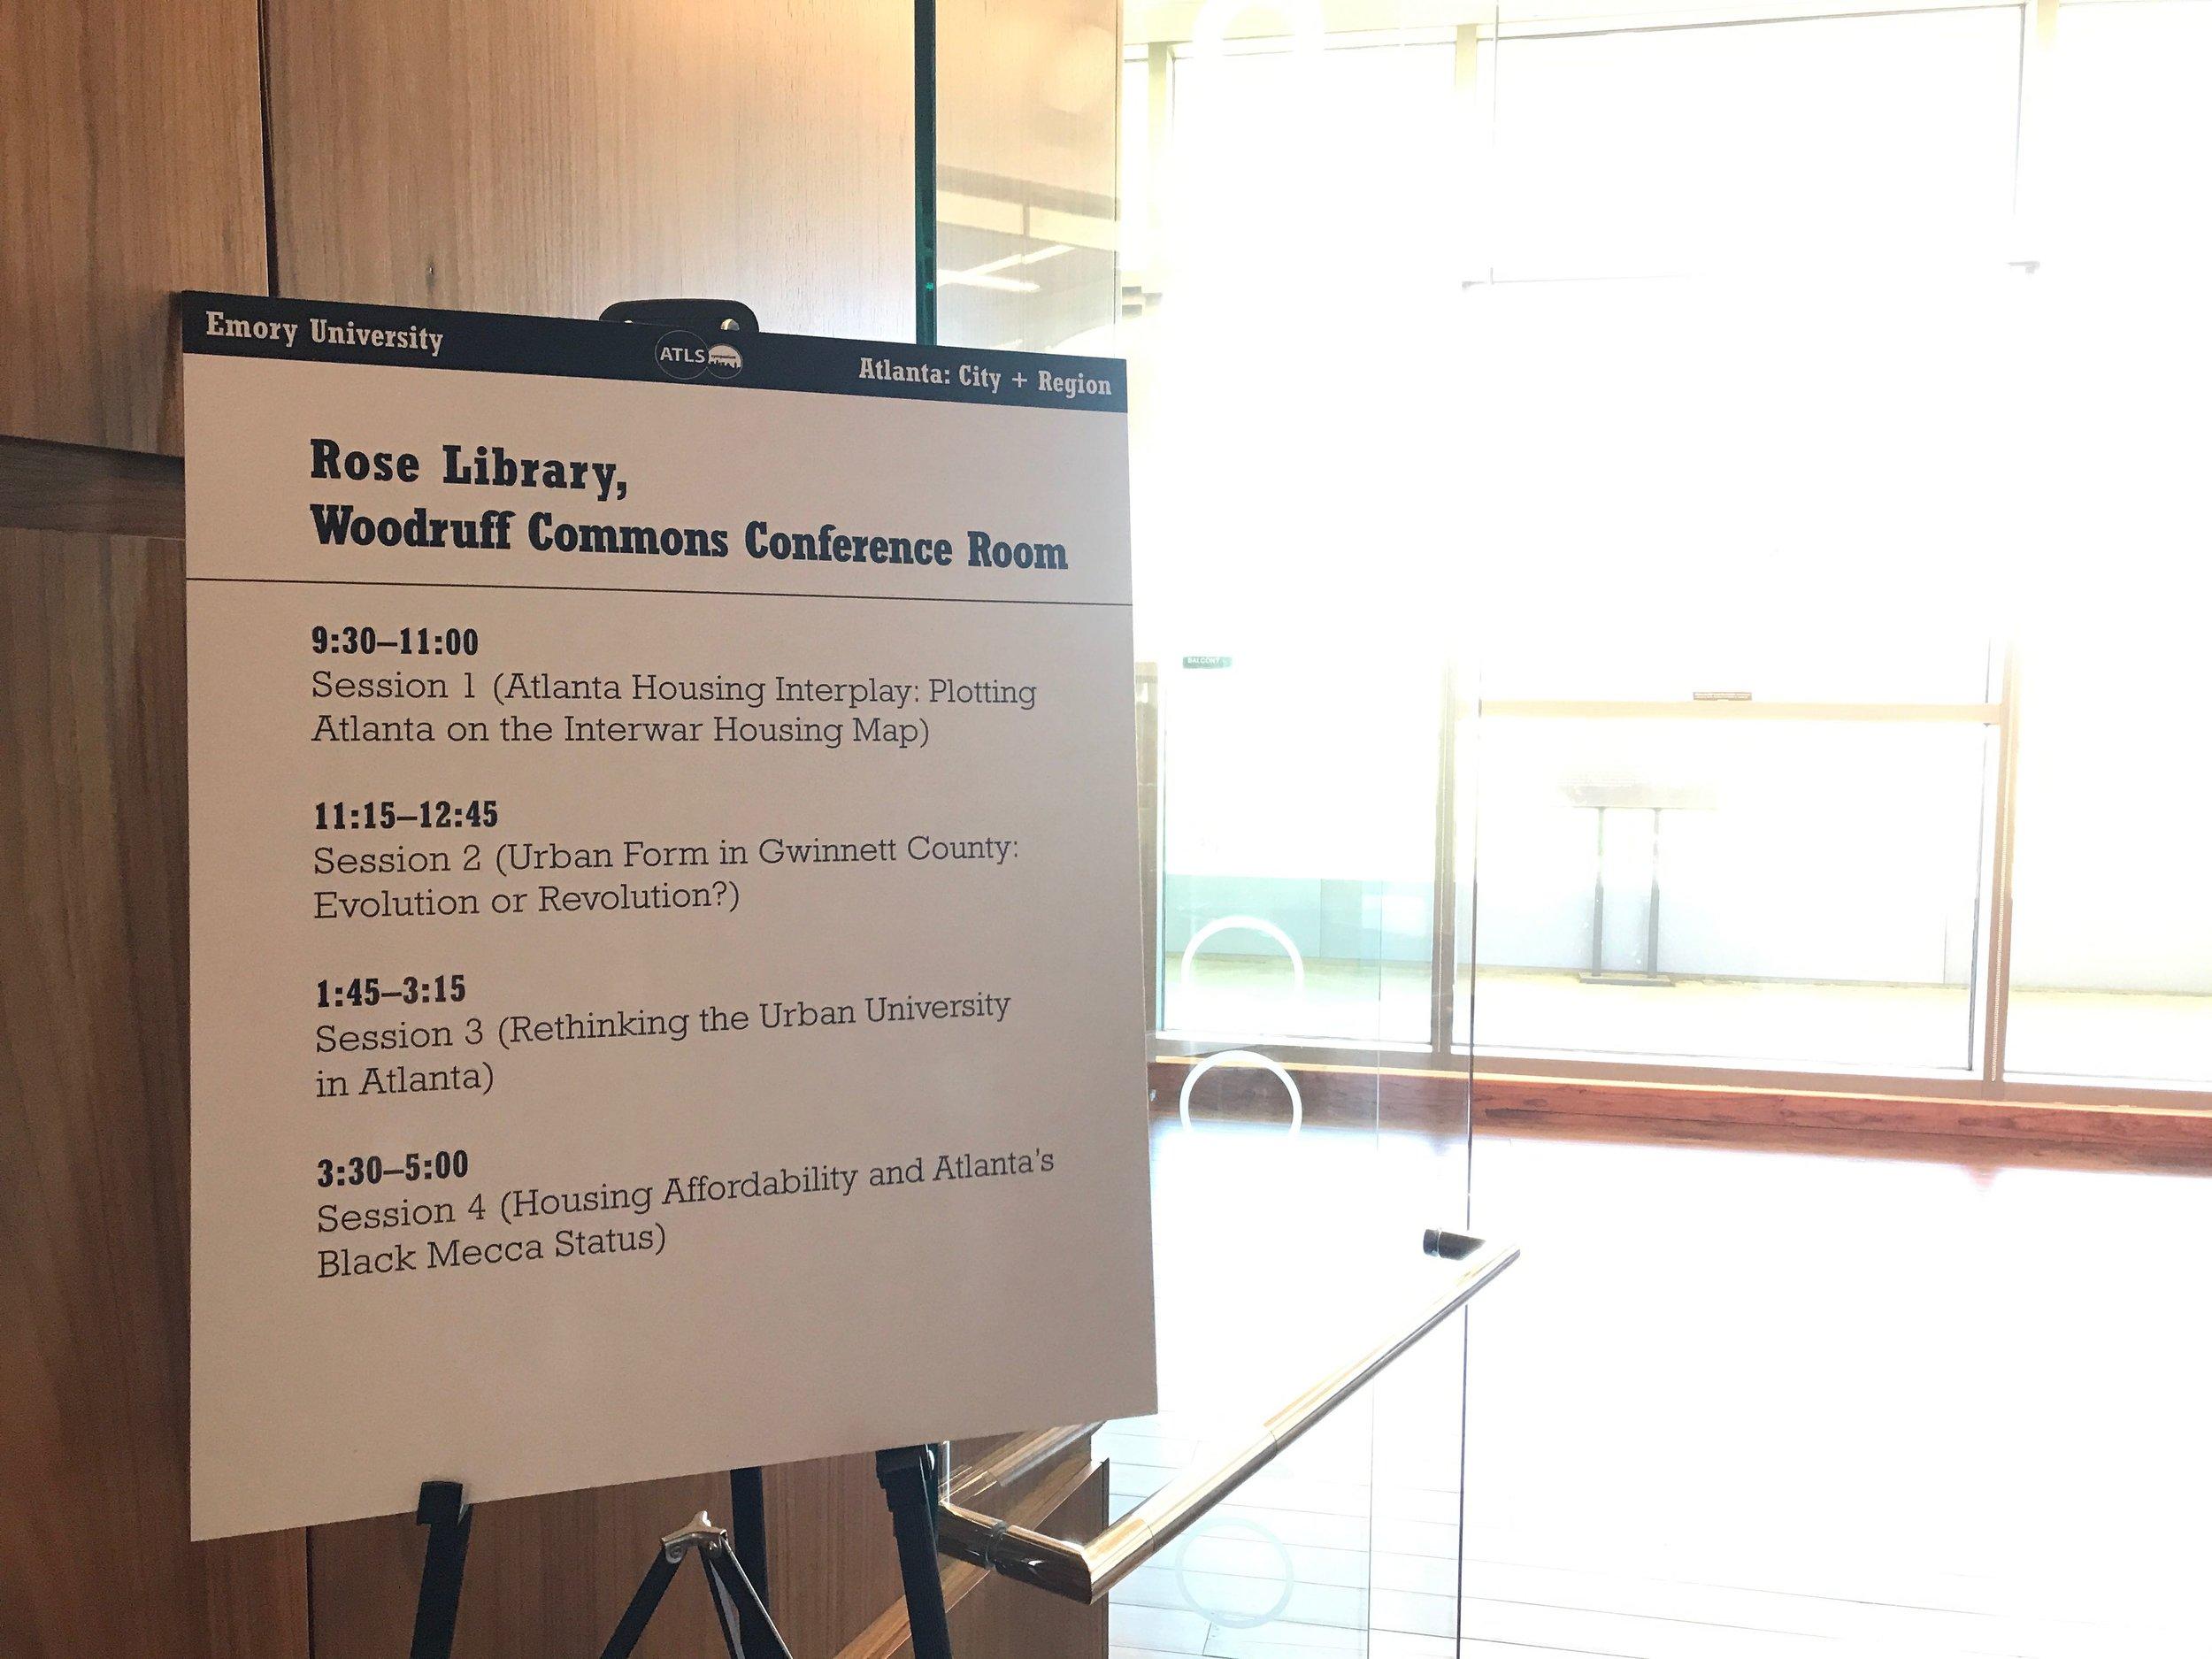 ATL STUDIES_Symposium_04-2018 - 5.jpg